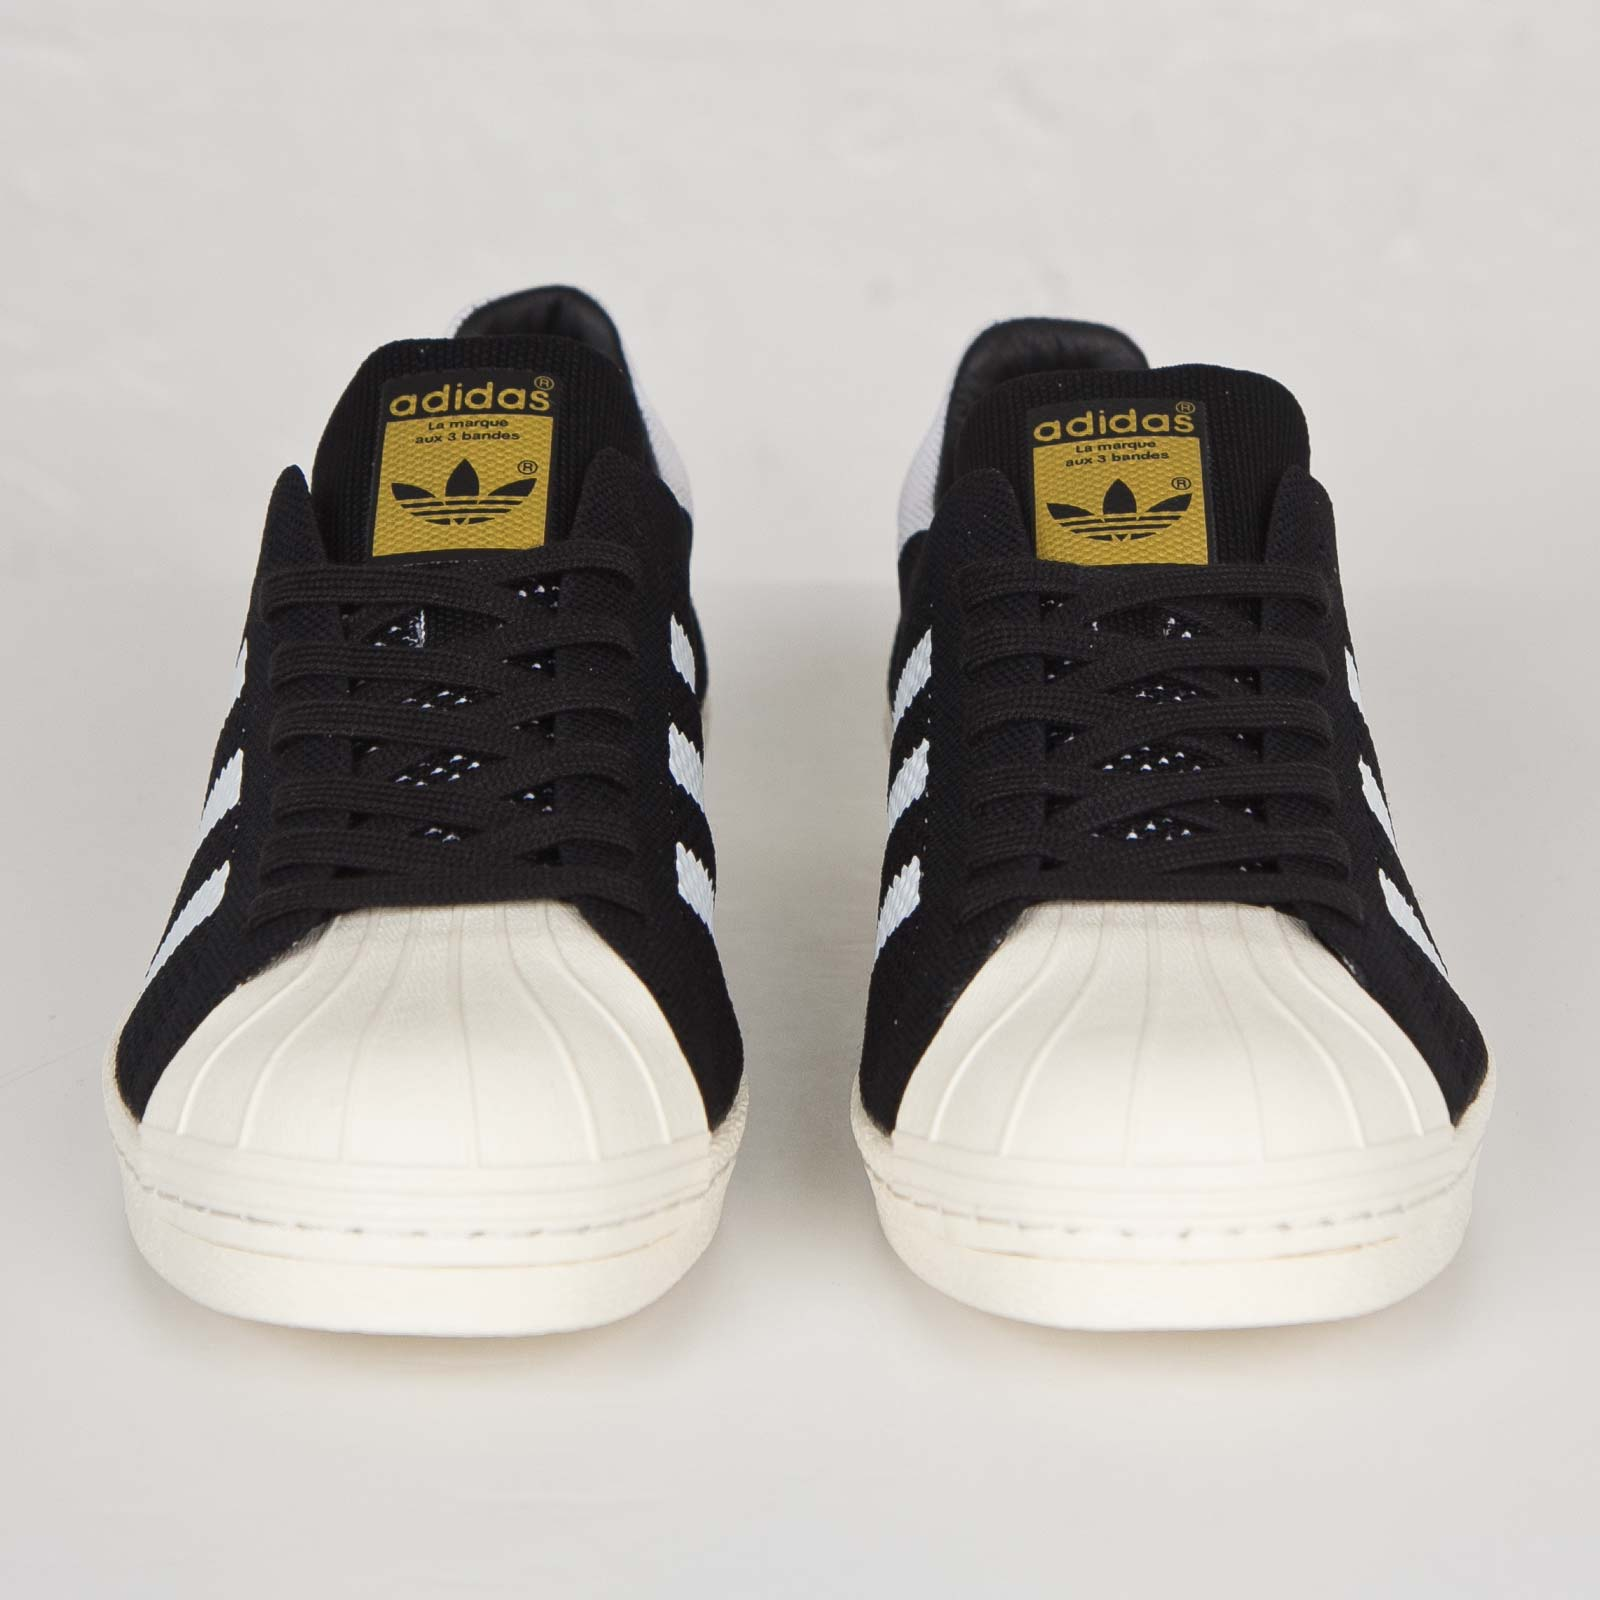 adidas Superstar 80s PK - S77439 - Sneakersnstuff   sneakers ... 6b51e3365b